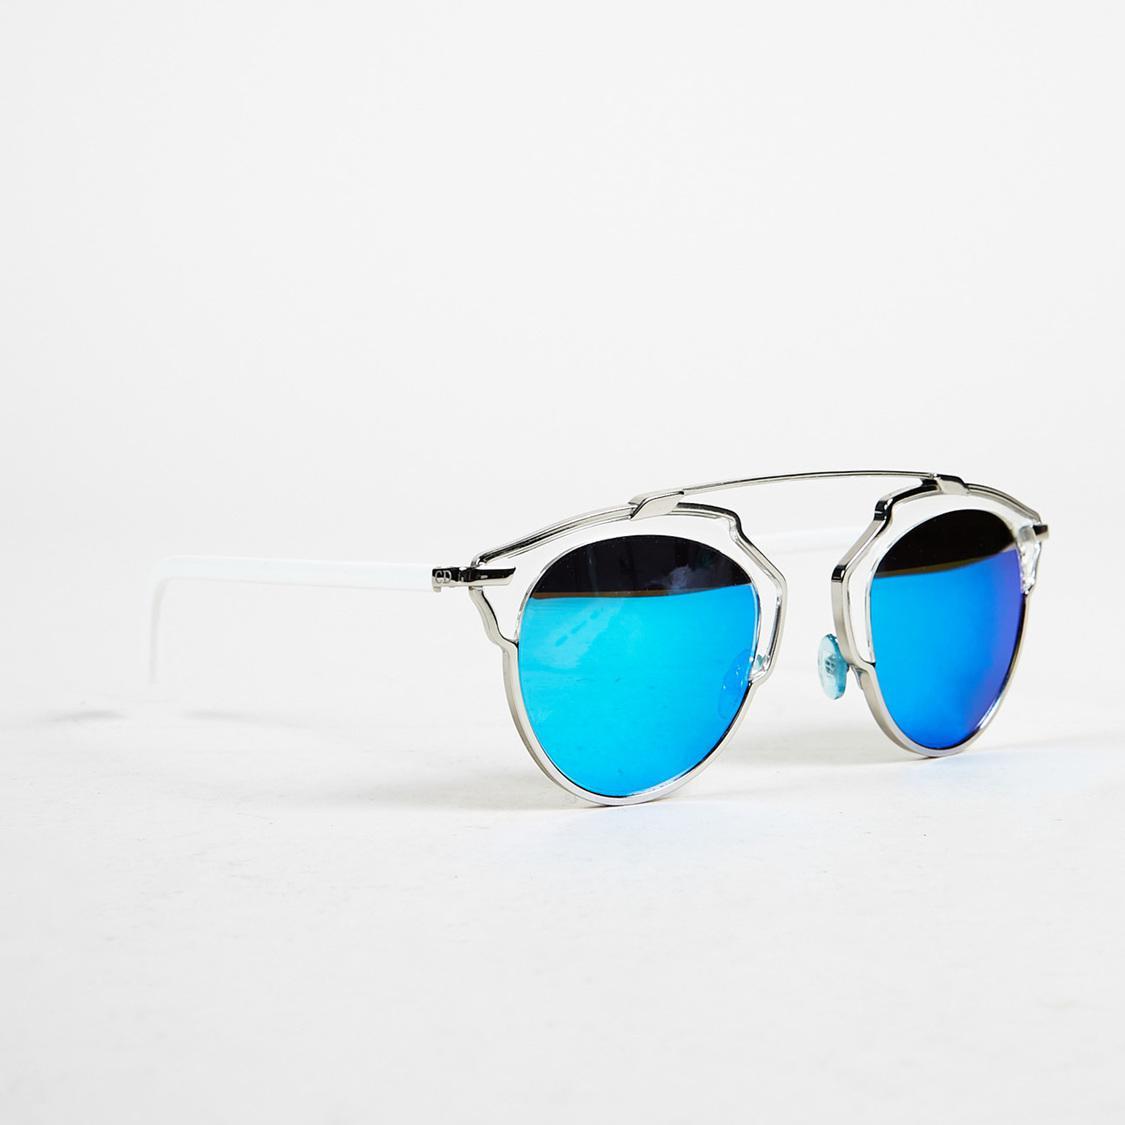 f1a4a5f6e411 Lyst - Dior Blue   Silver Tone Mirrored